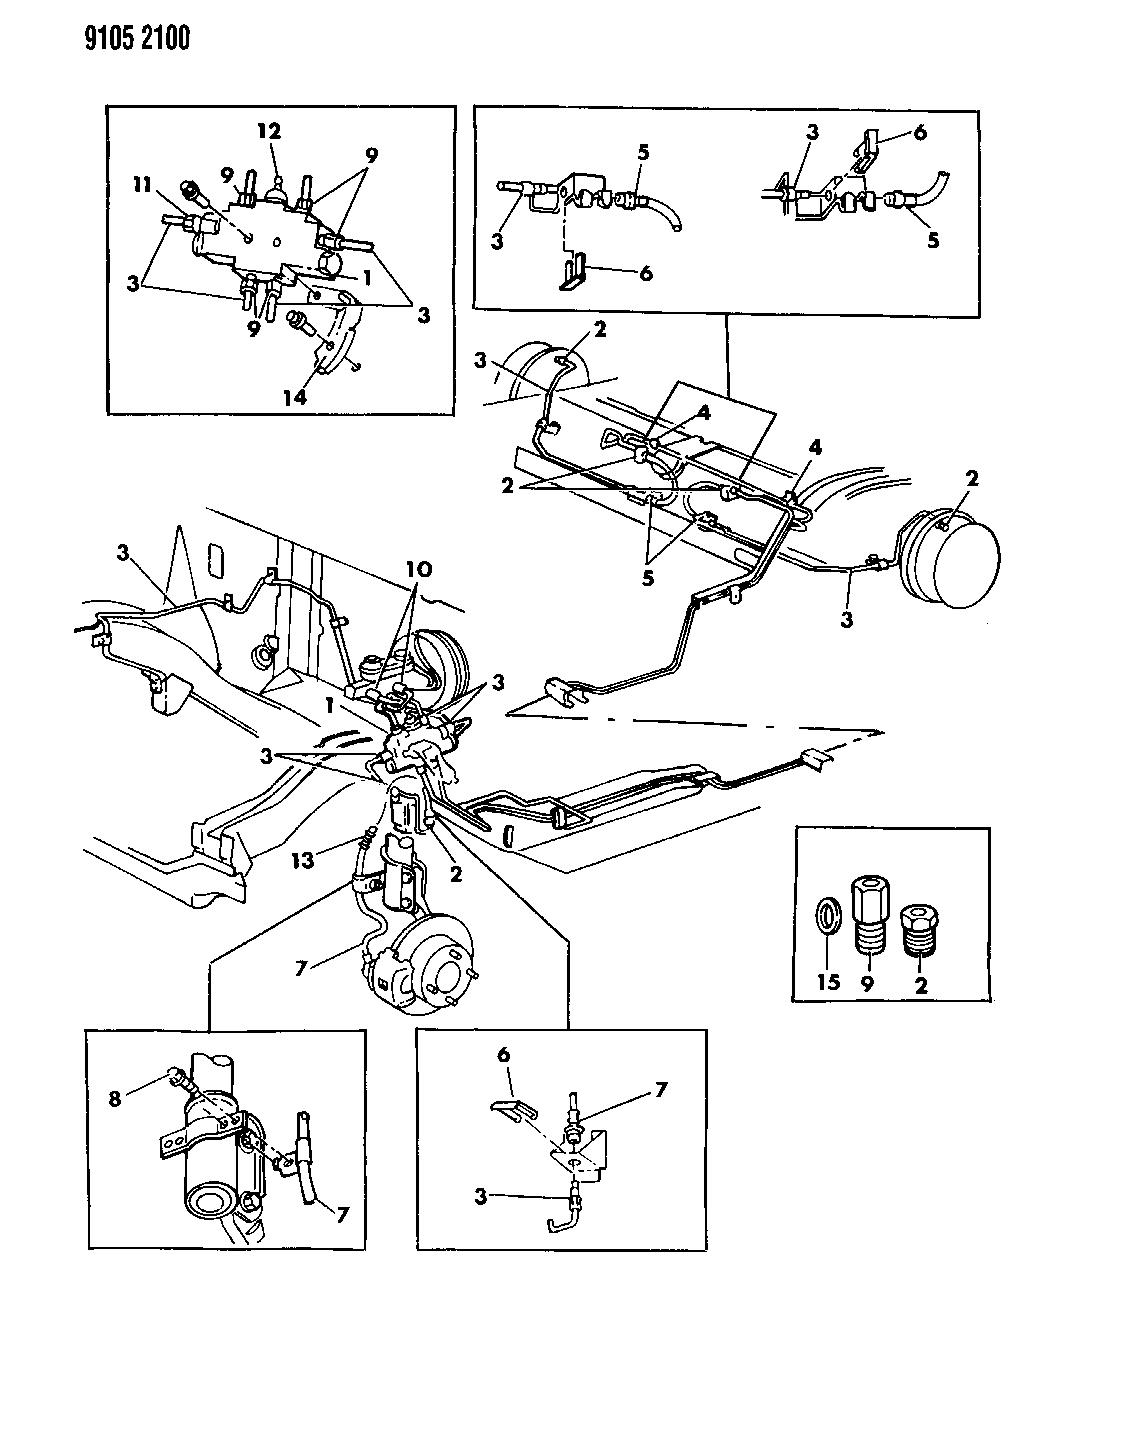 [WRG-7489] 1988 Dodge Omni Wiring Diagrams